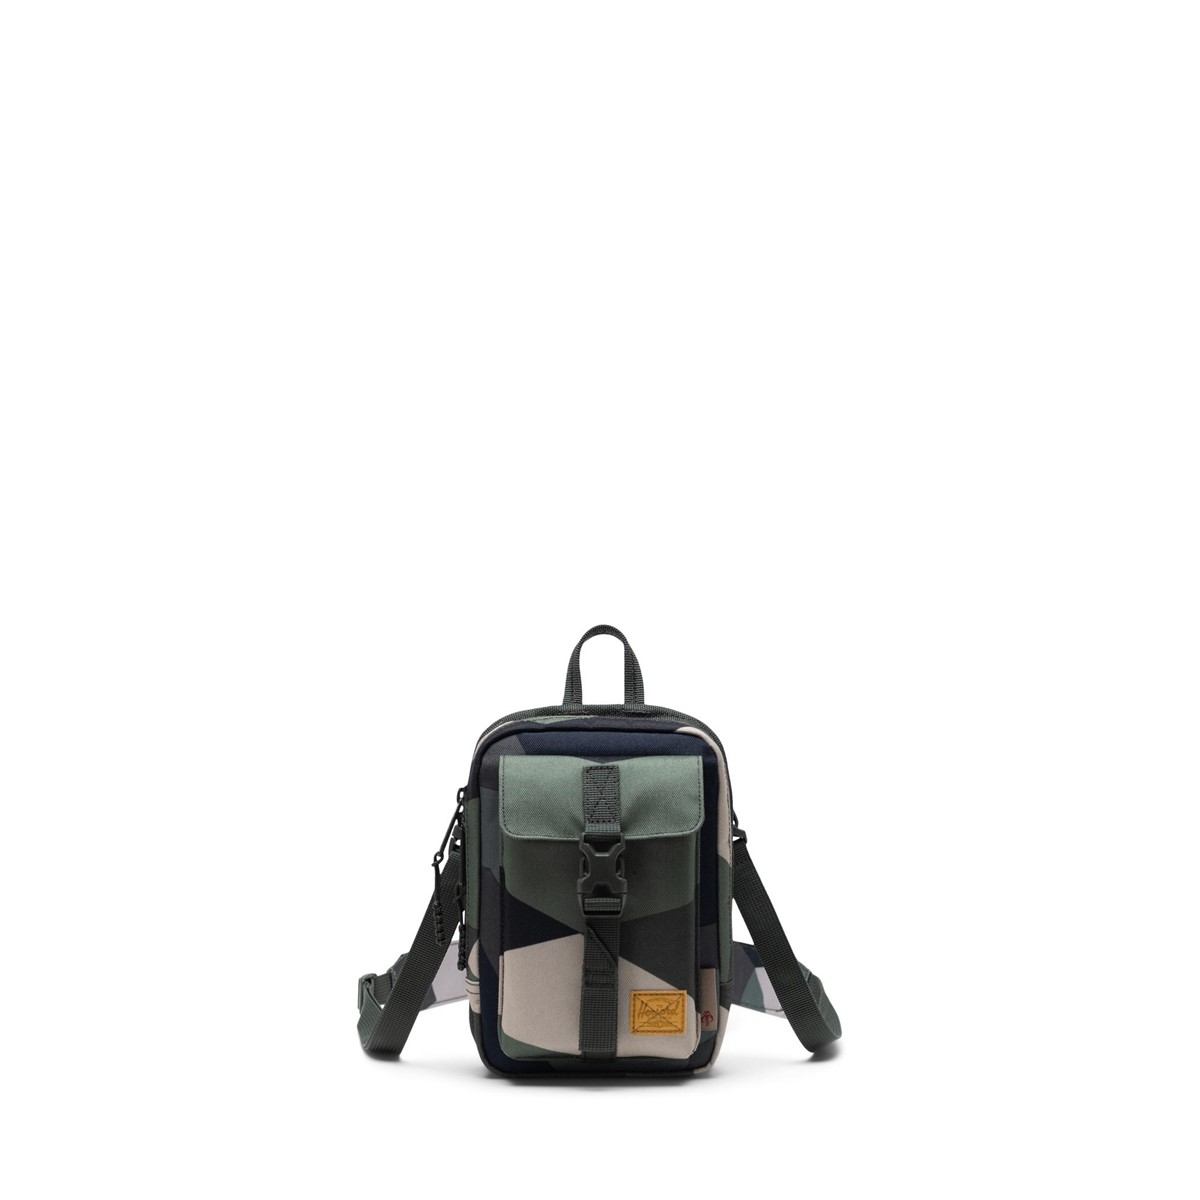 Star Wars Boba Fett Form Large Crossbody Bag